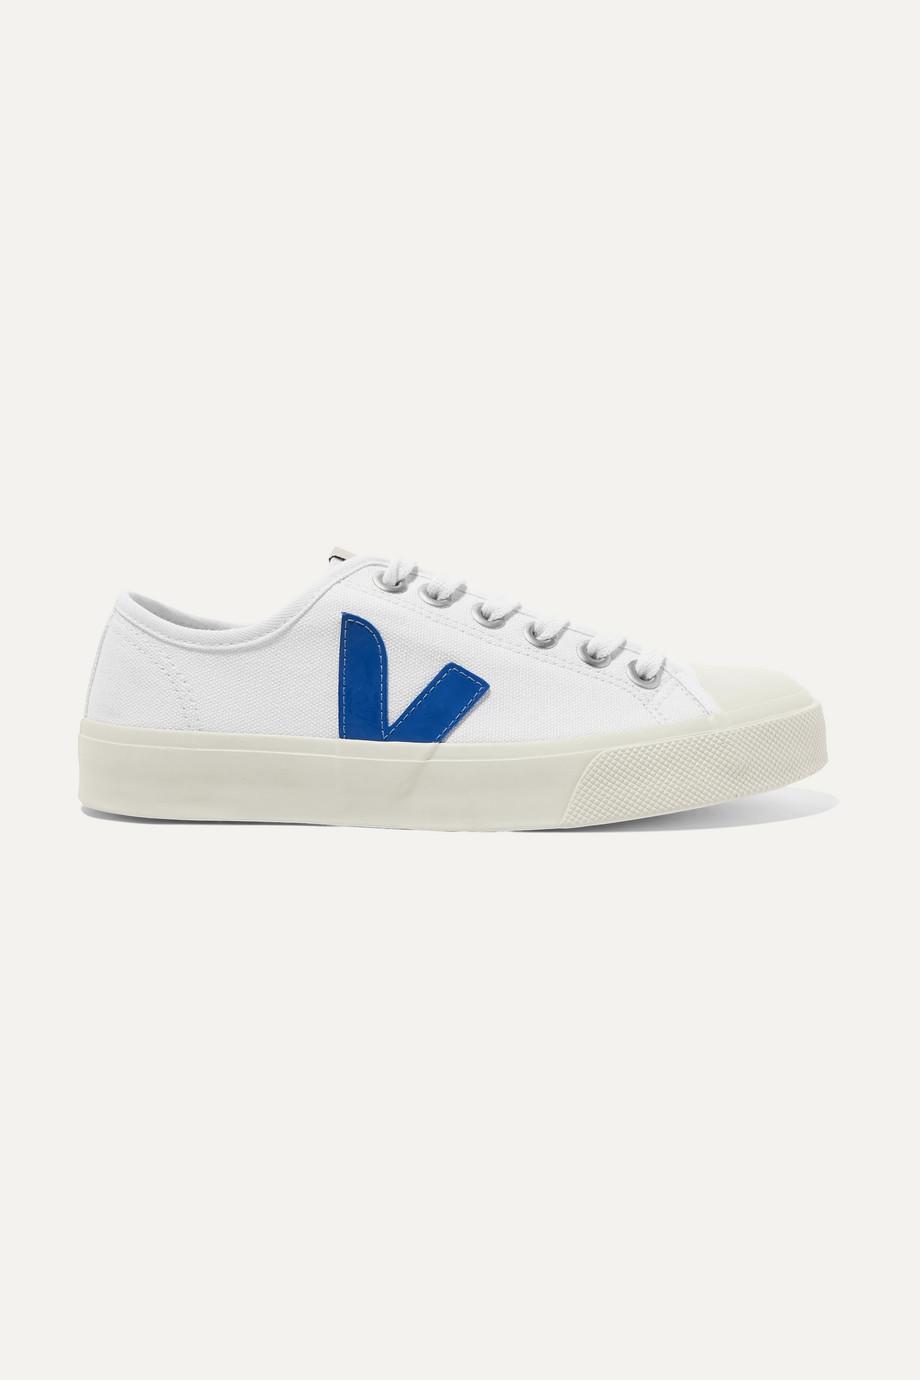 Wata organic cotton-canvas sneakers